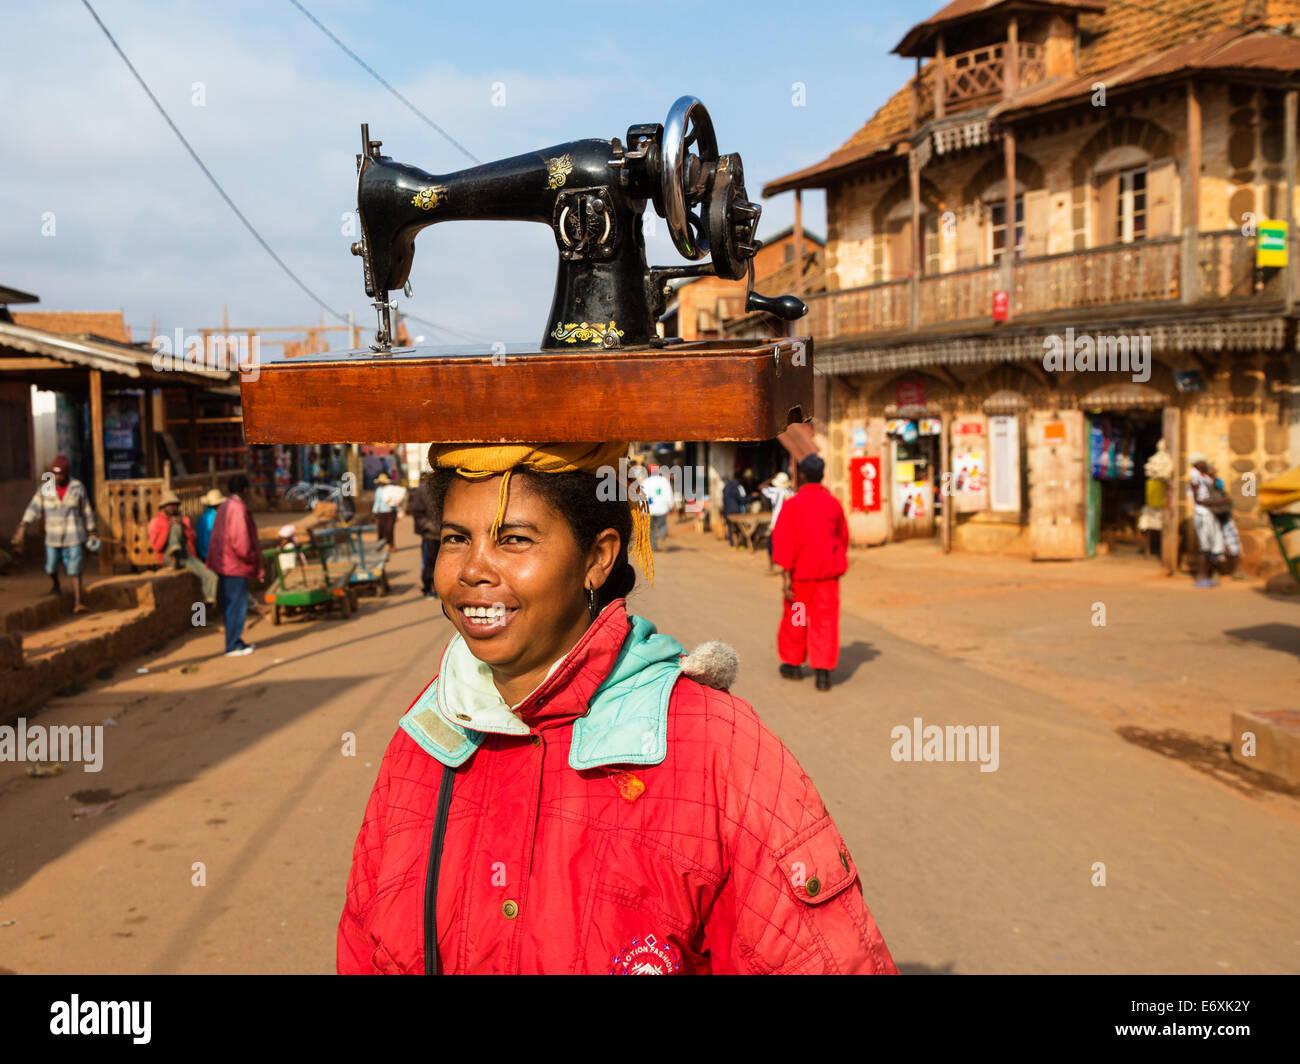 Madagascan woman carrying a sewing machine on her head, Betsileo tribe, Ambalavao, Fianarantsoa Region, Madagascar, - Stock Image